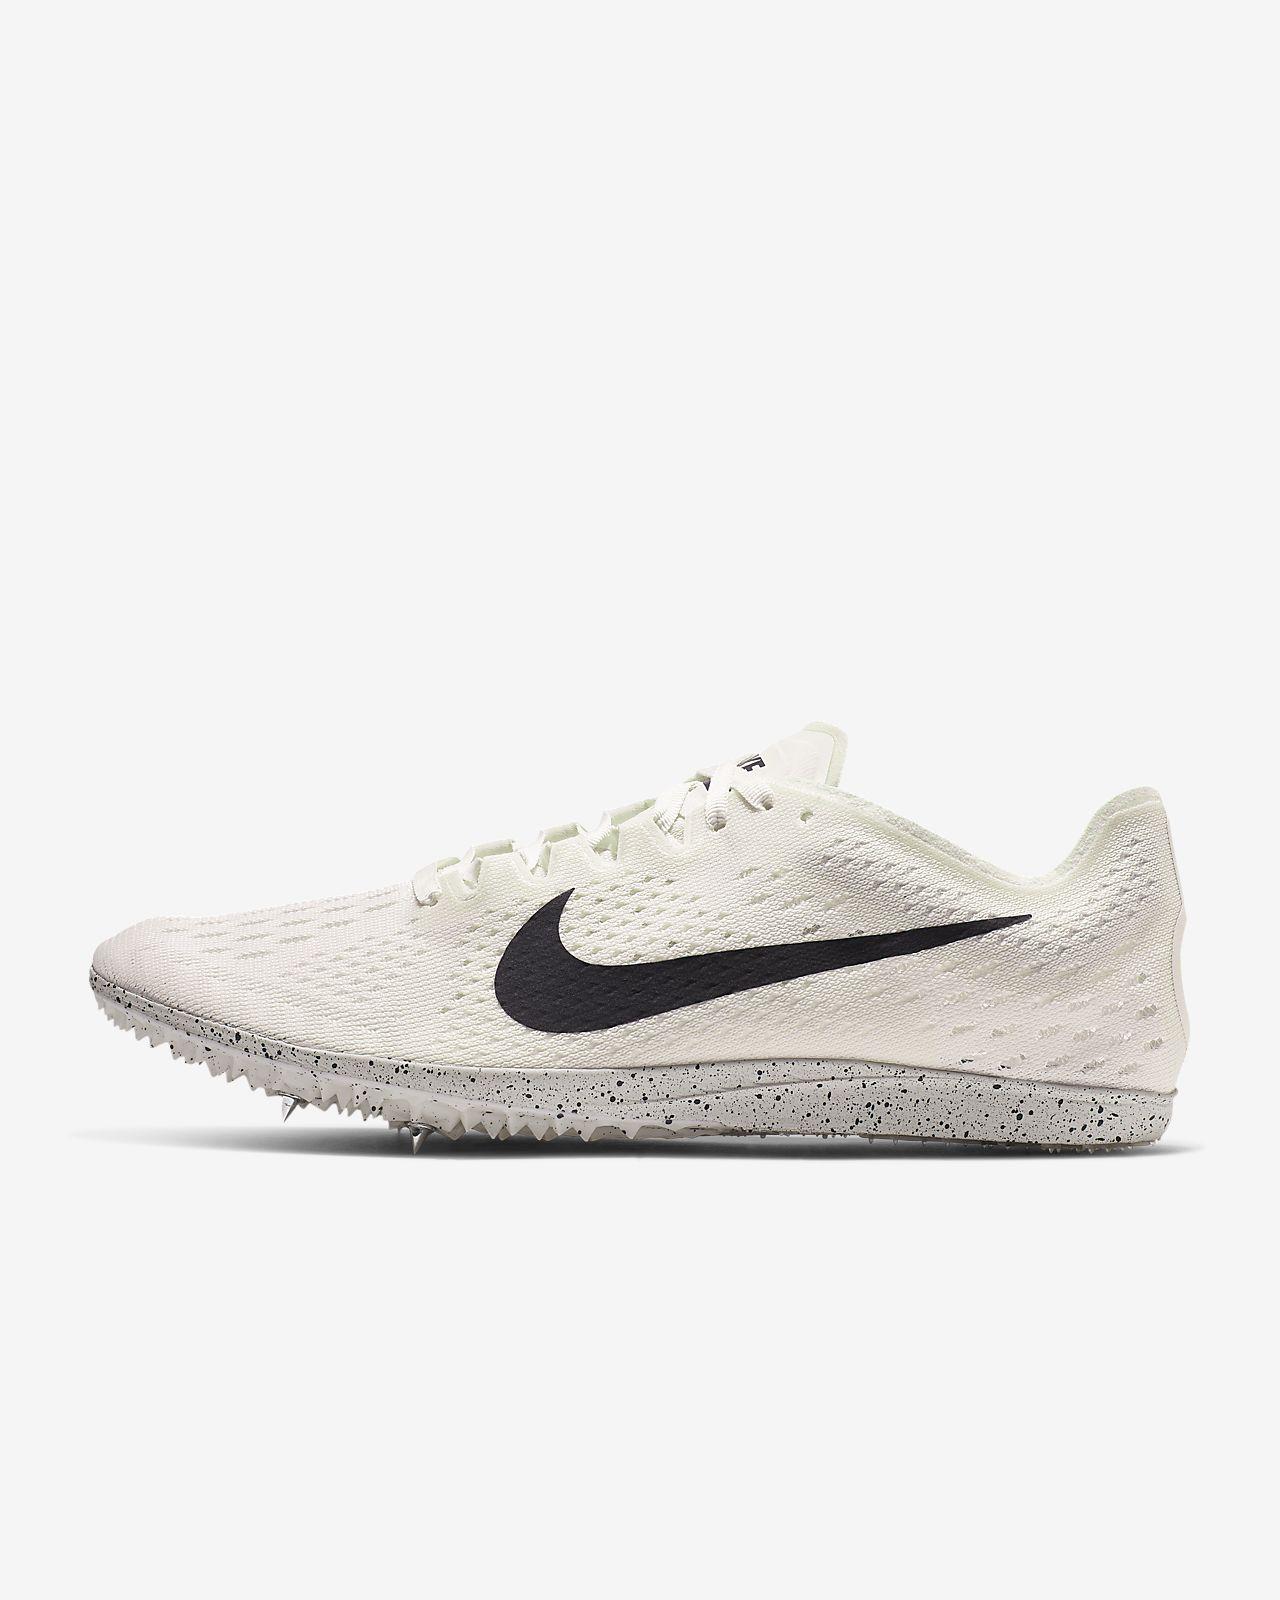 Unisex παπούτσι στίβου Nike Zoom Matumbo 3